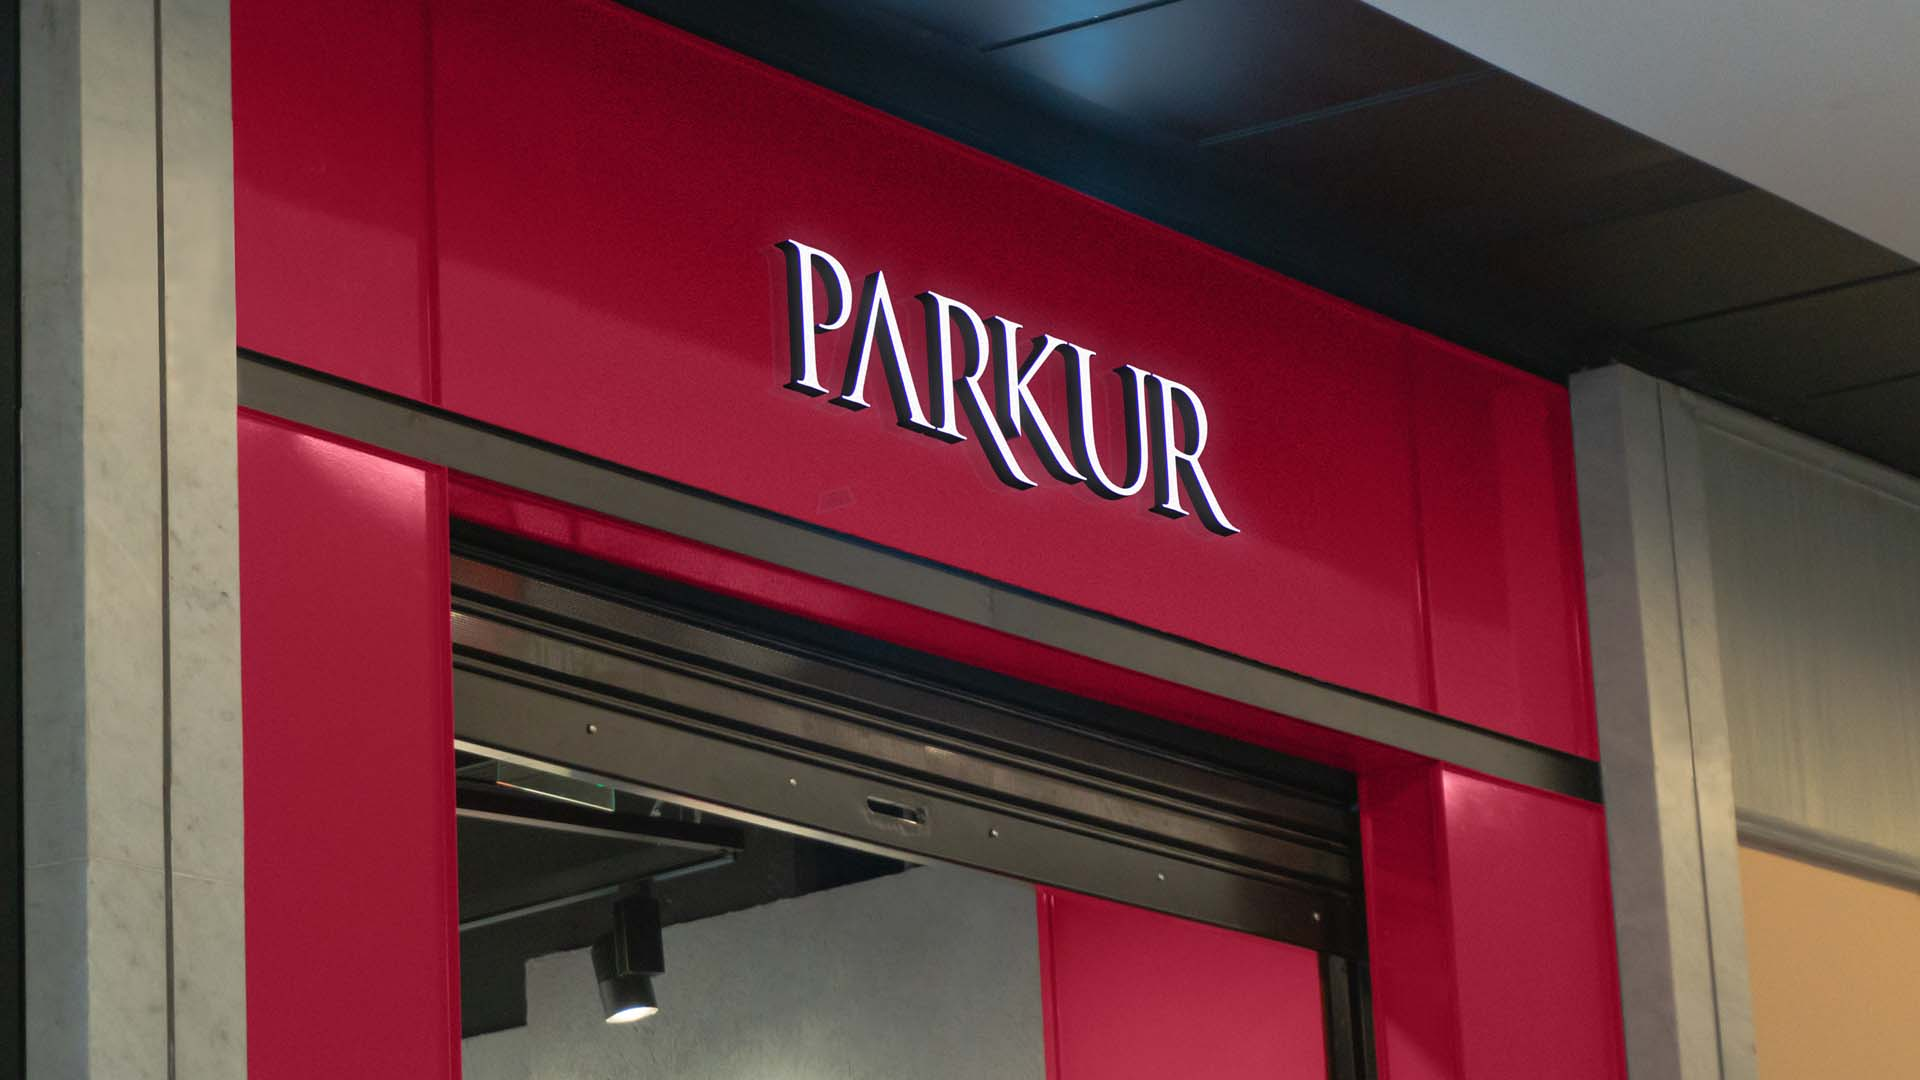 Parkur-Branding-4